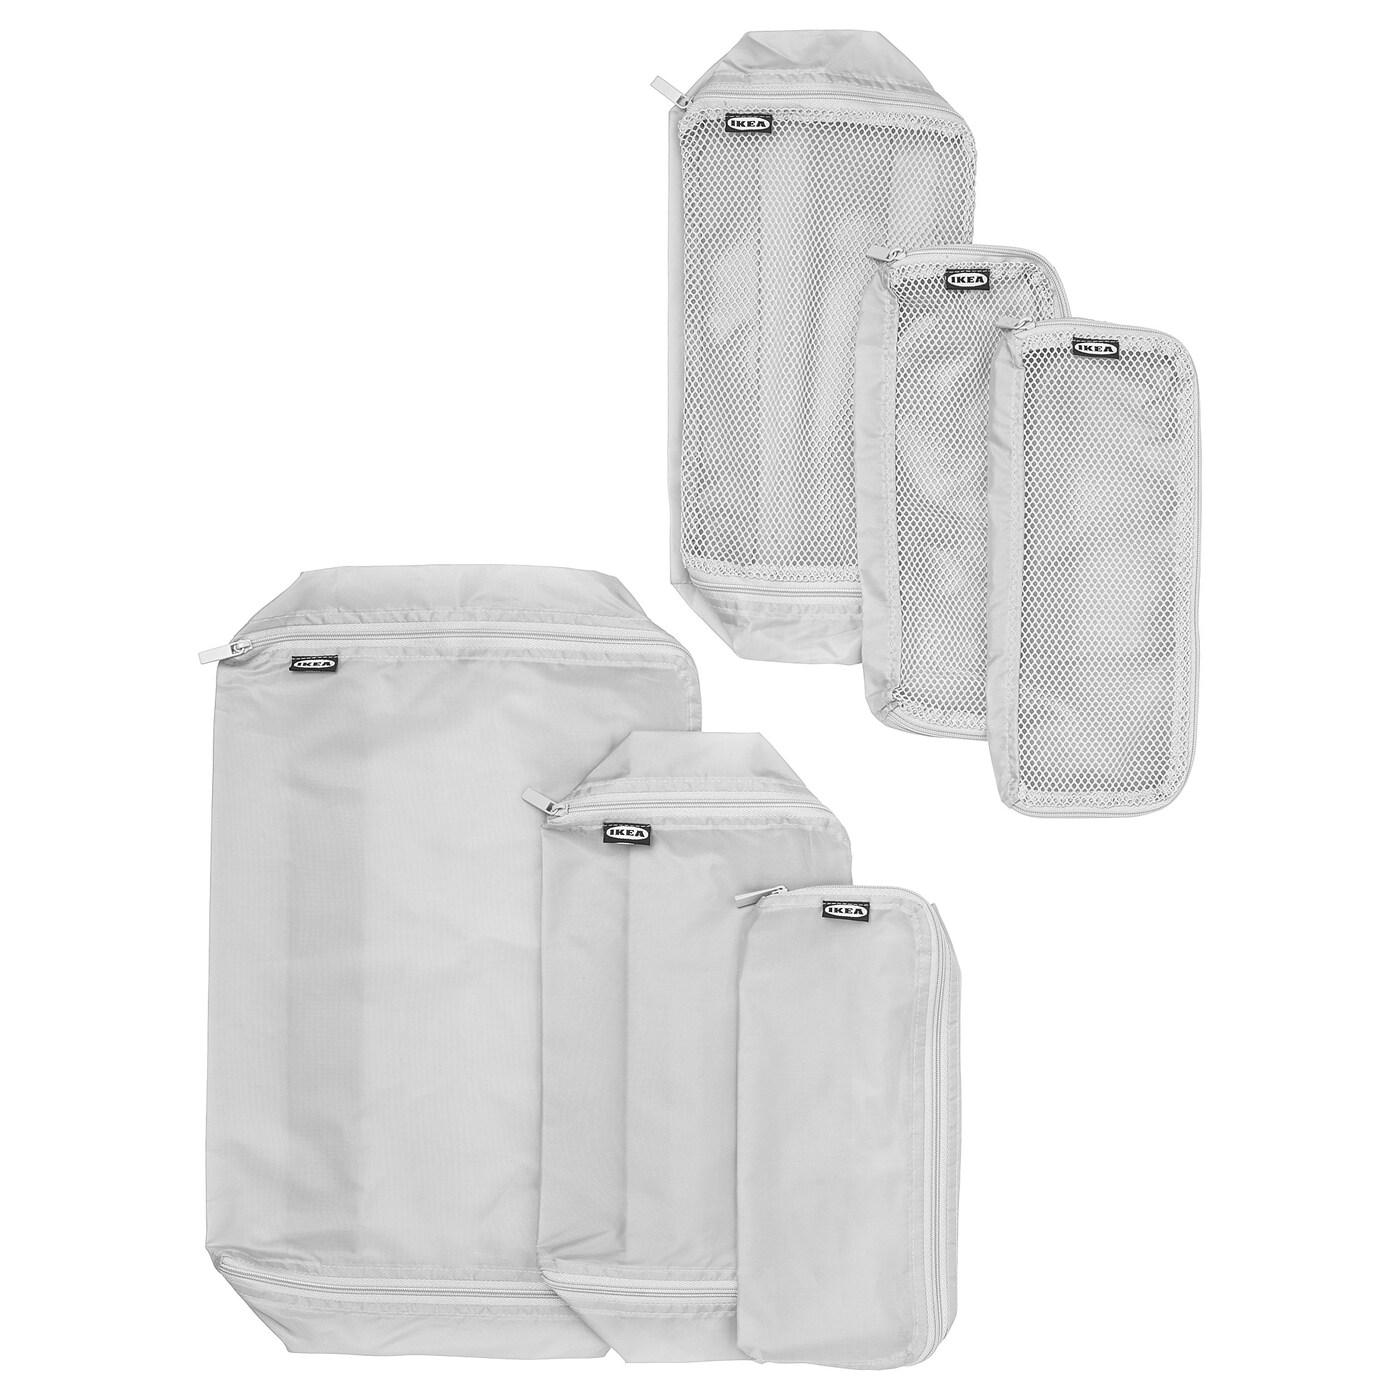 a92a1f4e0e02 Упаковочная сумка, 6 шт. ФОРФИНА артикуль № 203.620.62 в наличии. Онлайн